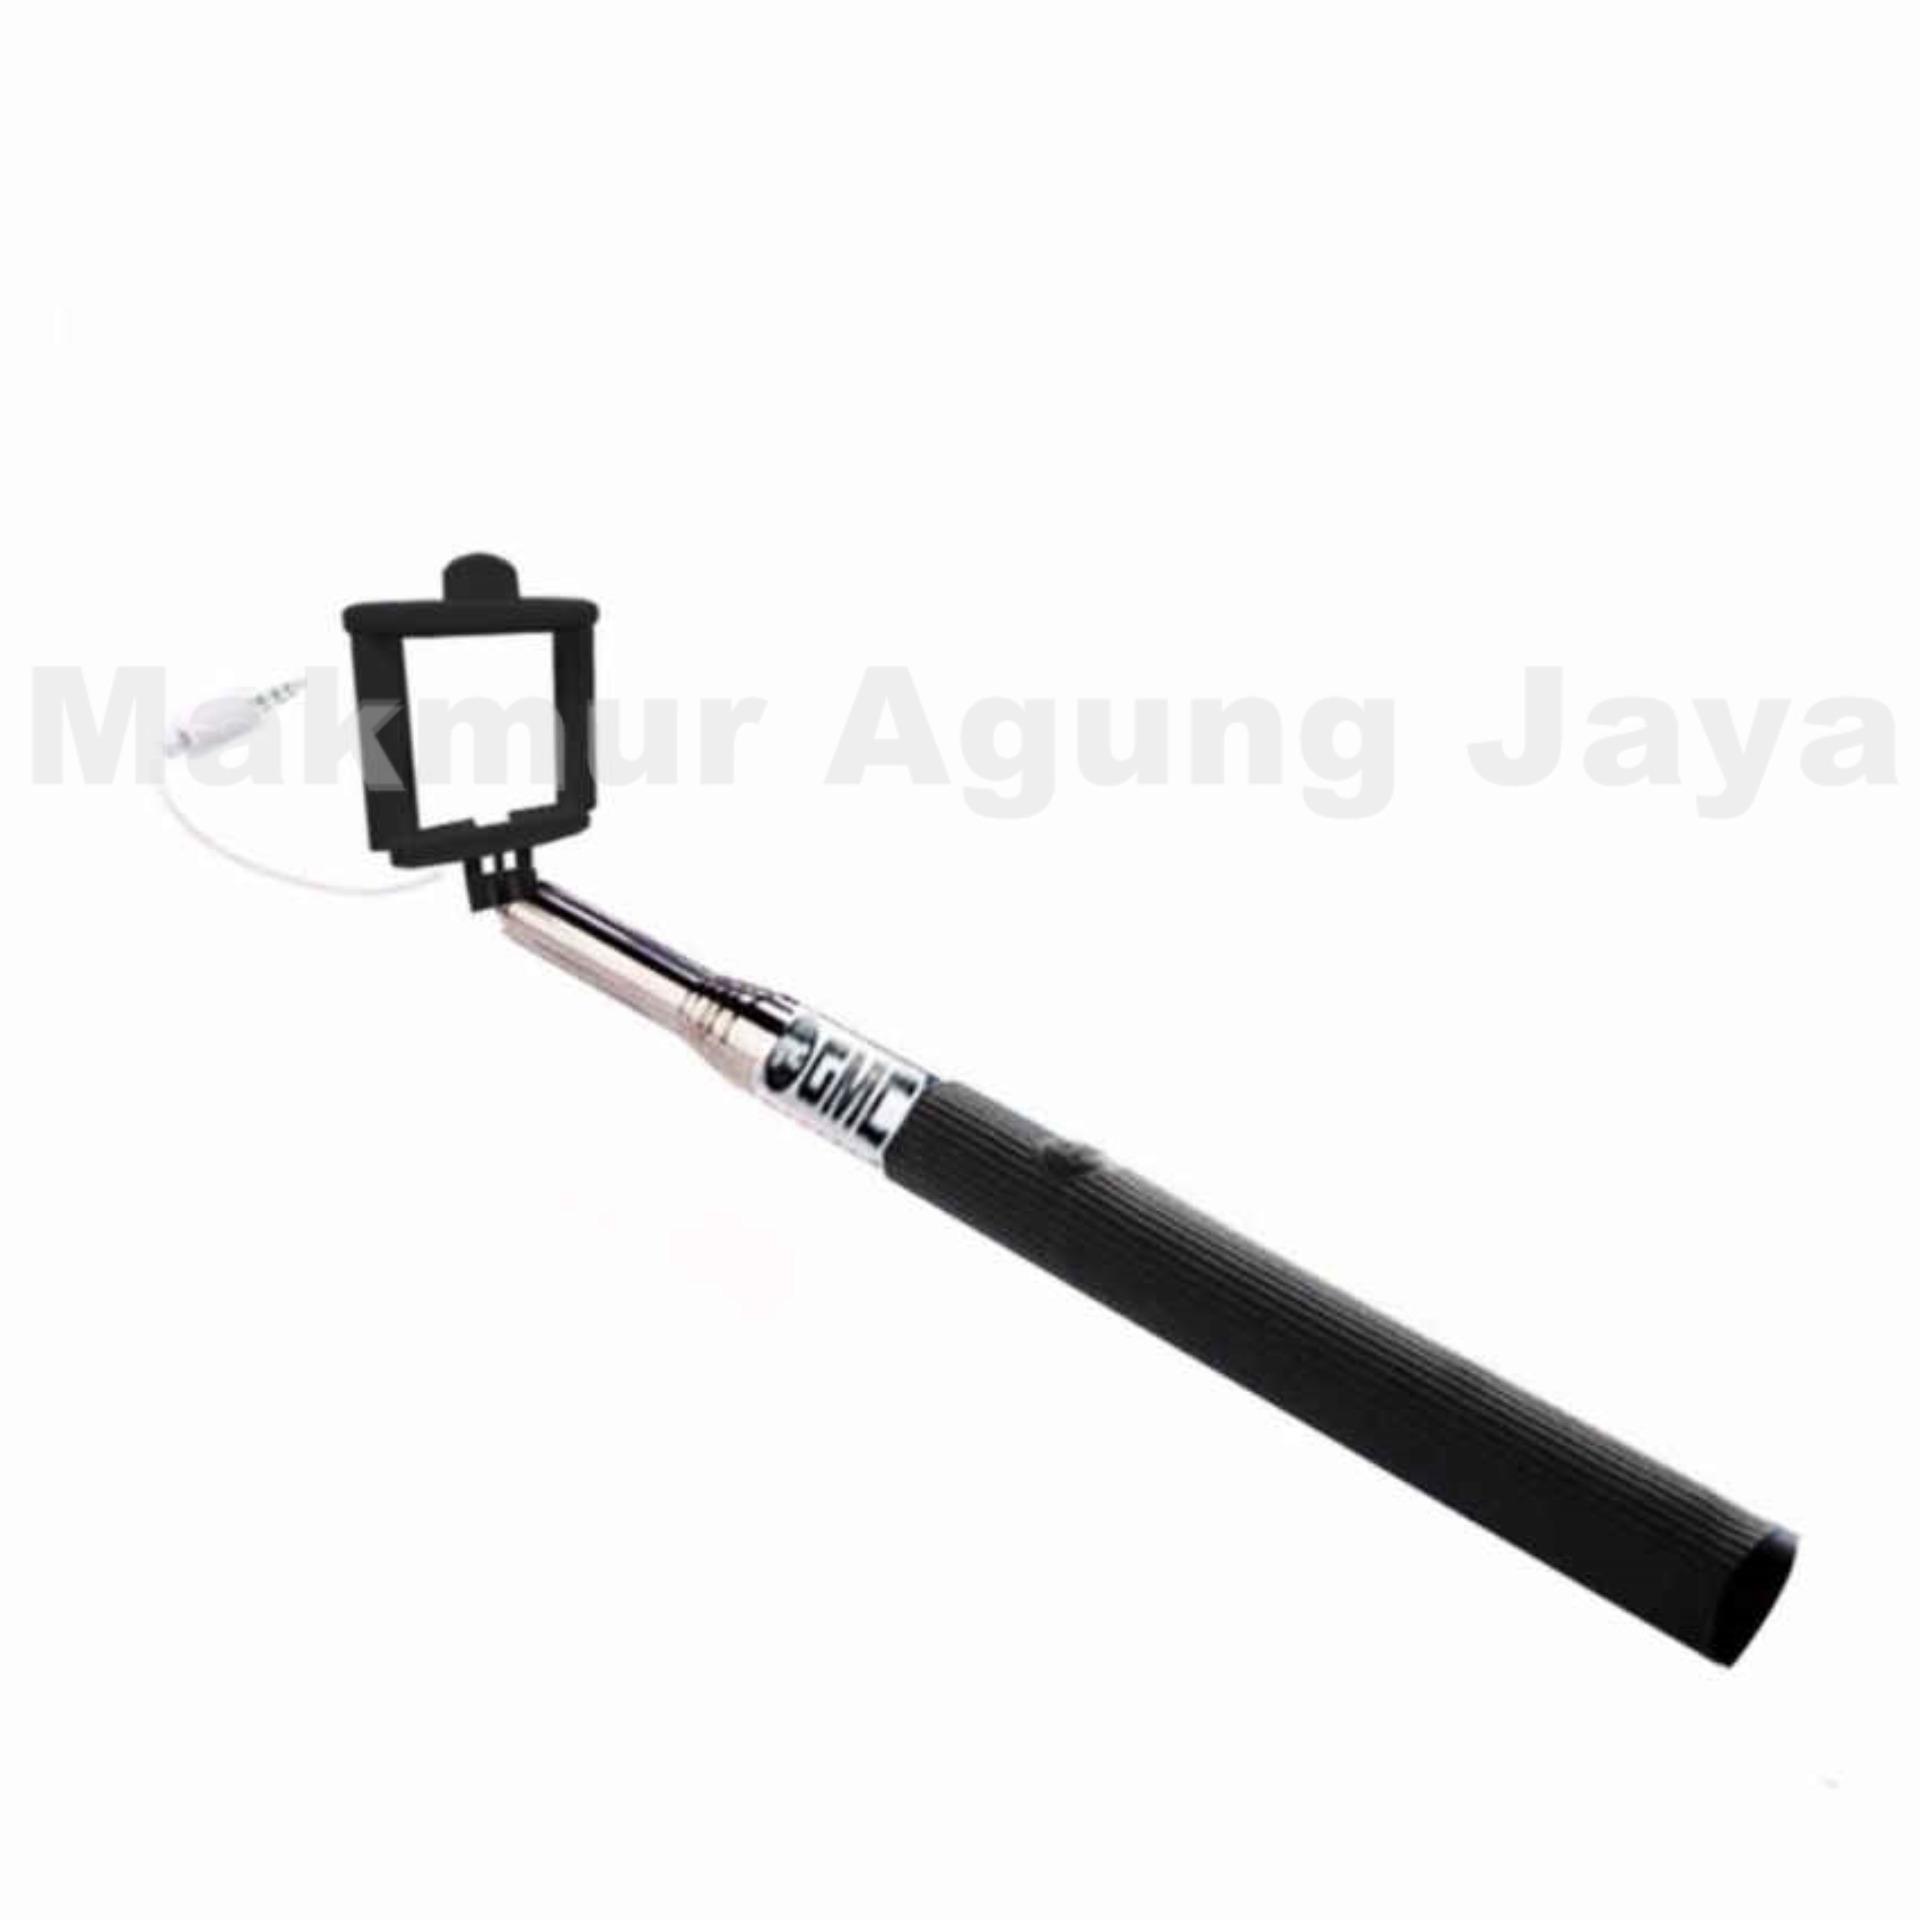 ... MAJ Tongsis Monopod Selfie Stick Kabel Lipat Dengan Tombol - Warna Random ...